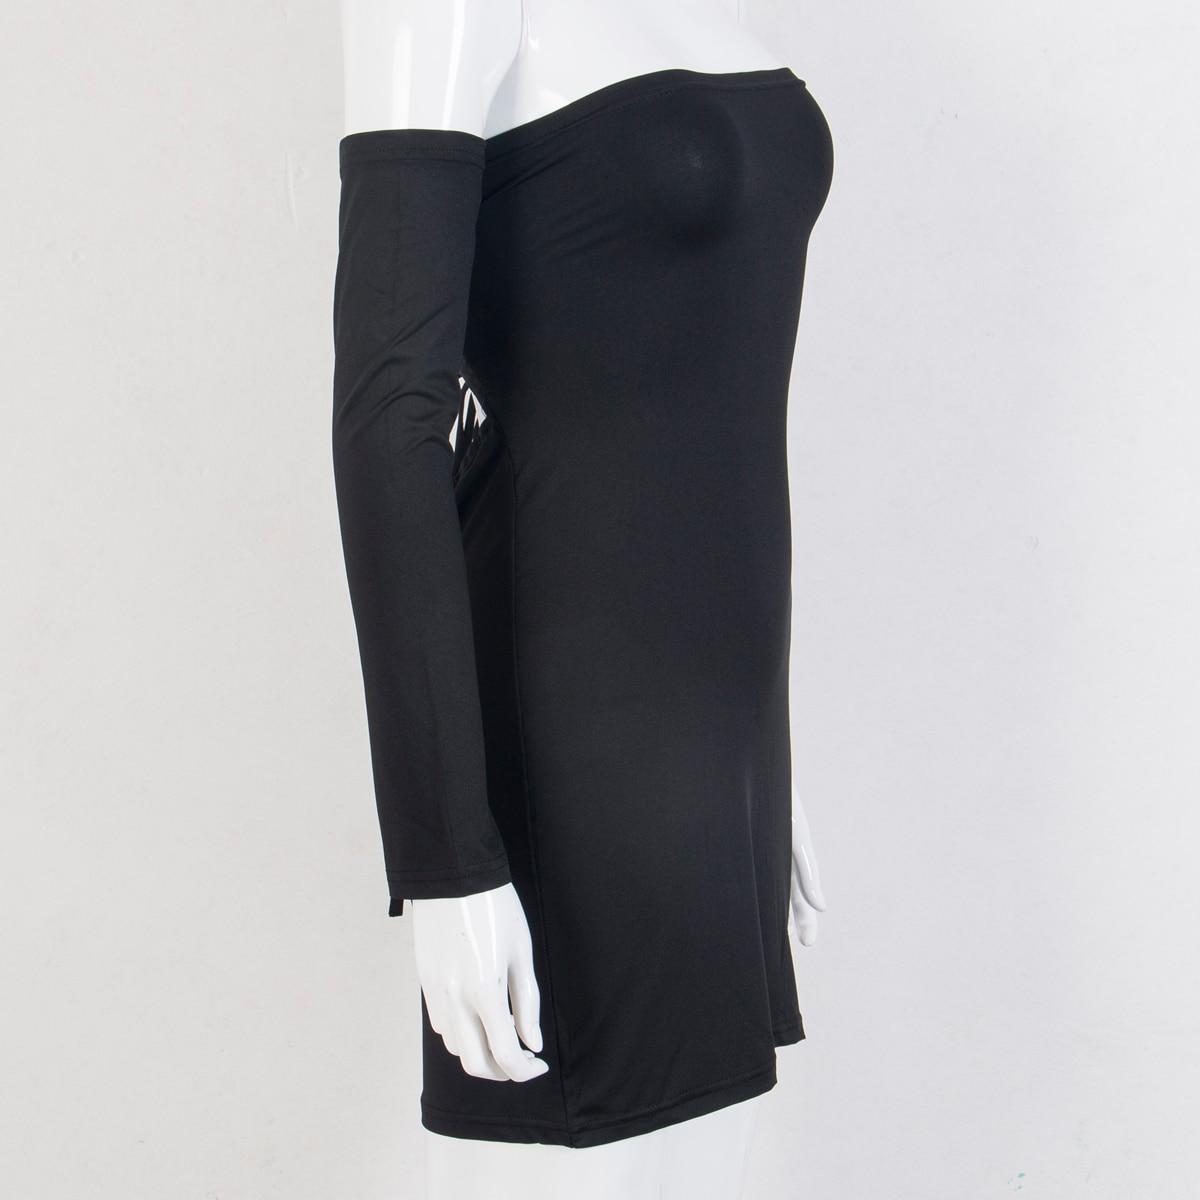 HTB1FjQ6mvBNTKJjSszeq6Au2VXab Hirigin Women's Summer Long Sleeve Slash Neck Hollow Bandage Bodycon Night Club Party Dress